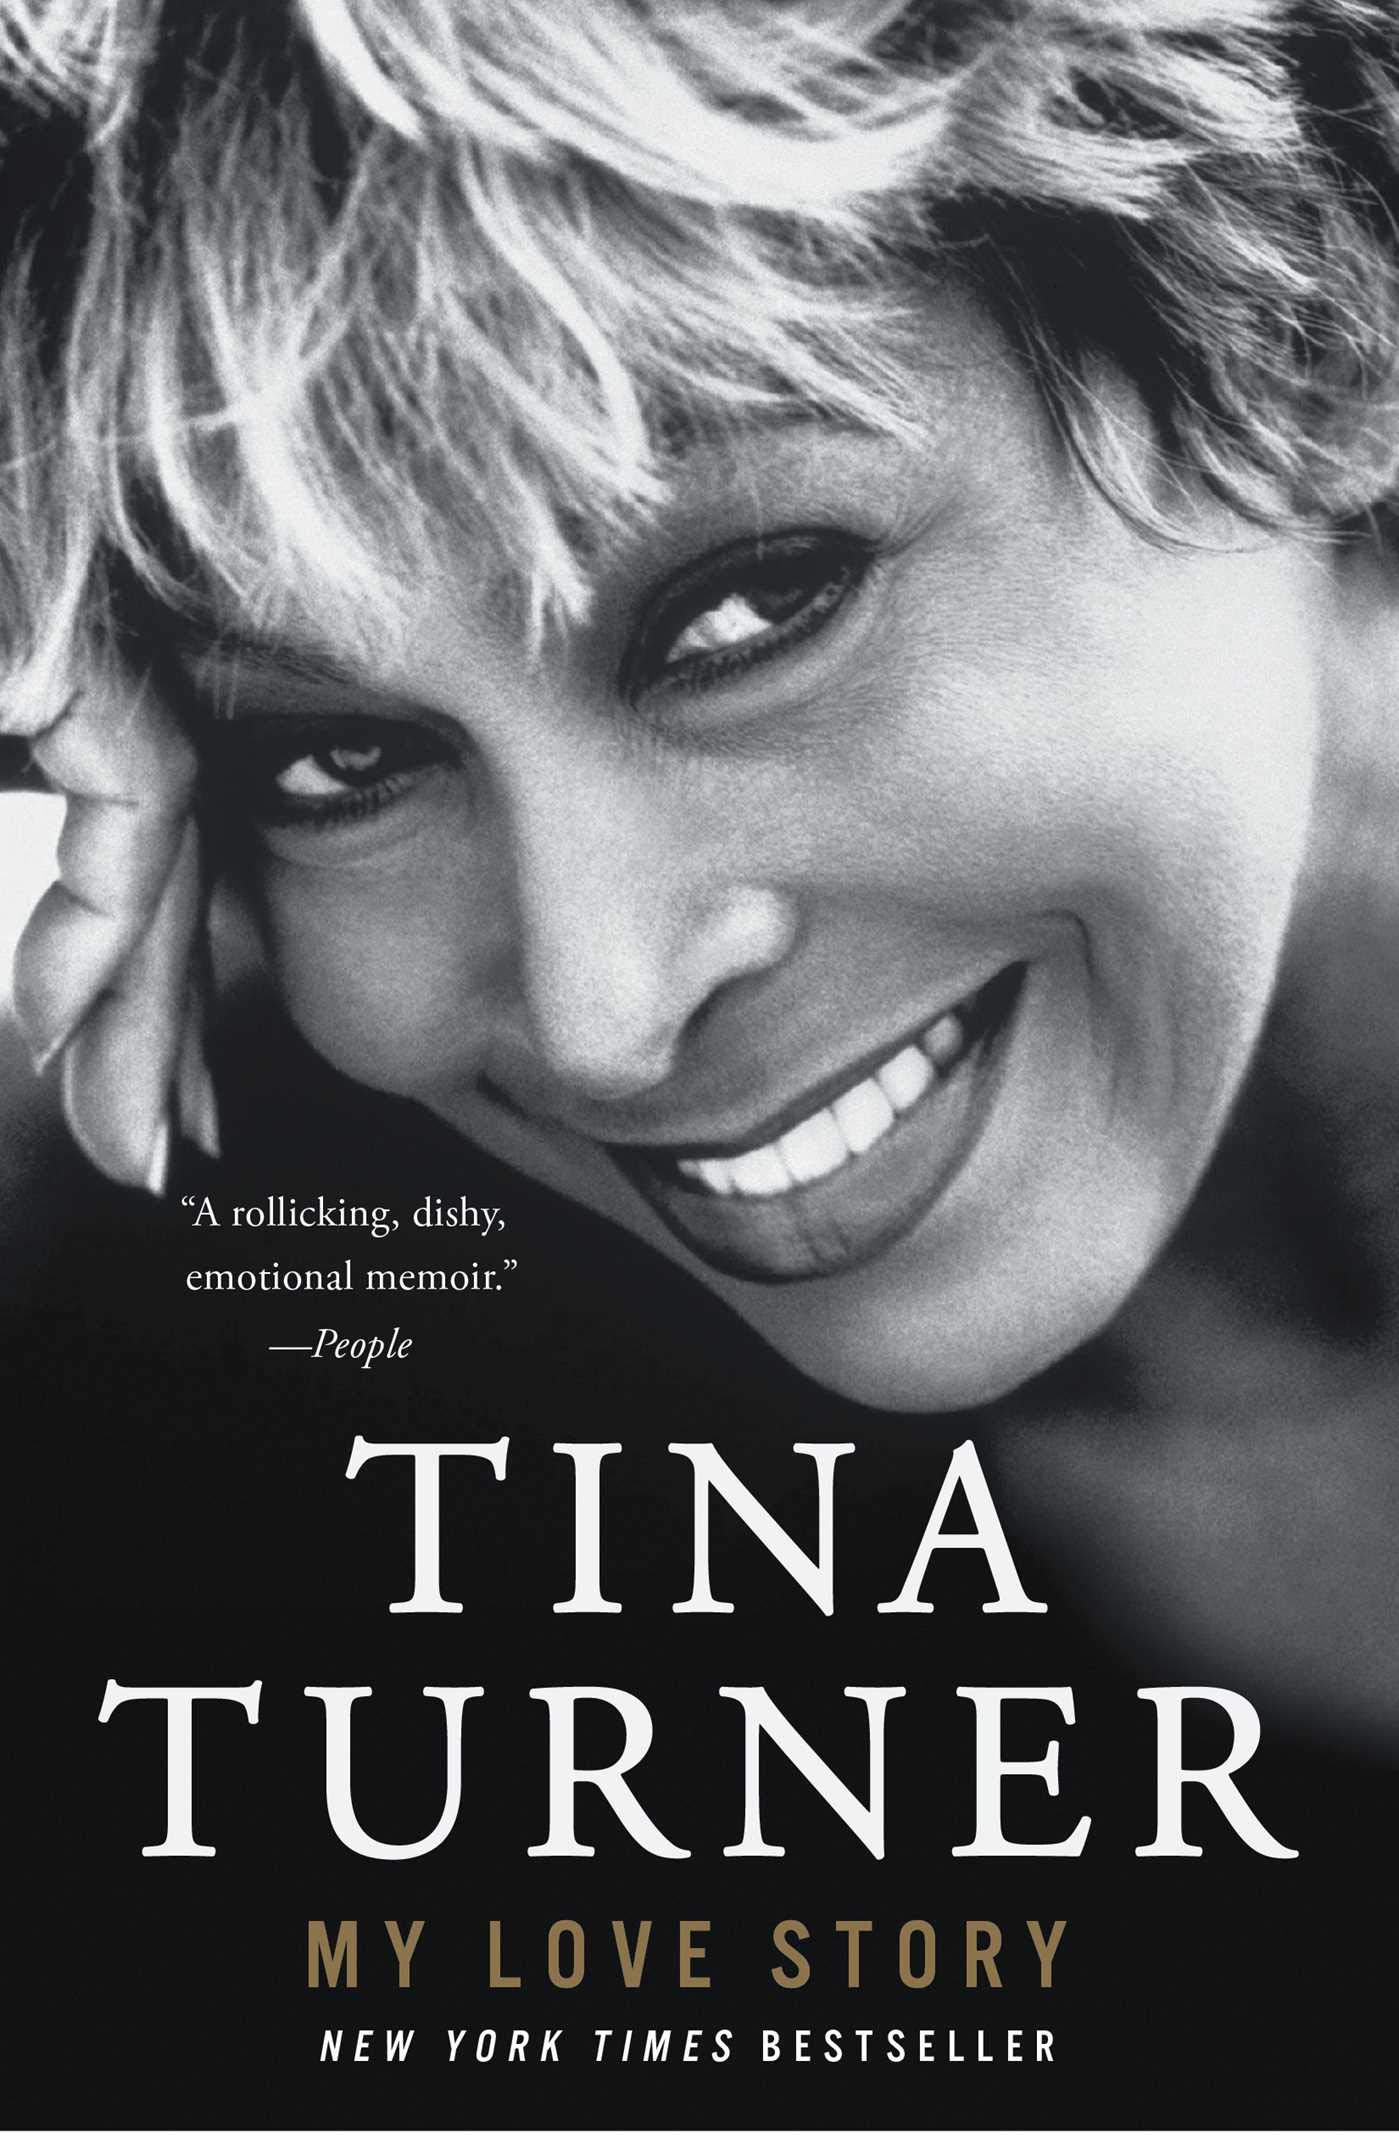 My Love Story Tina Turner product image